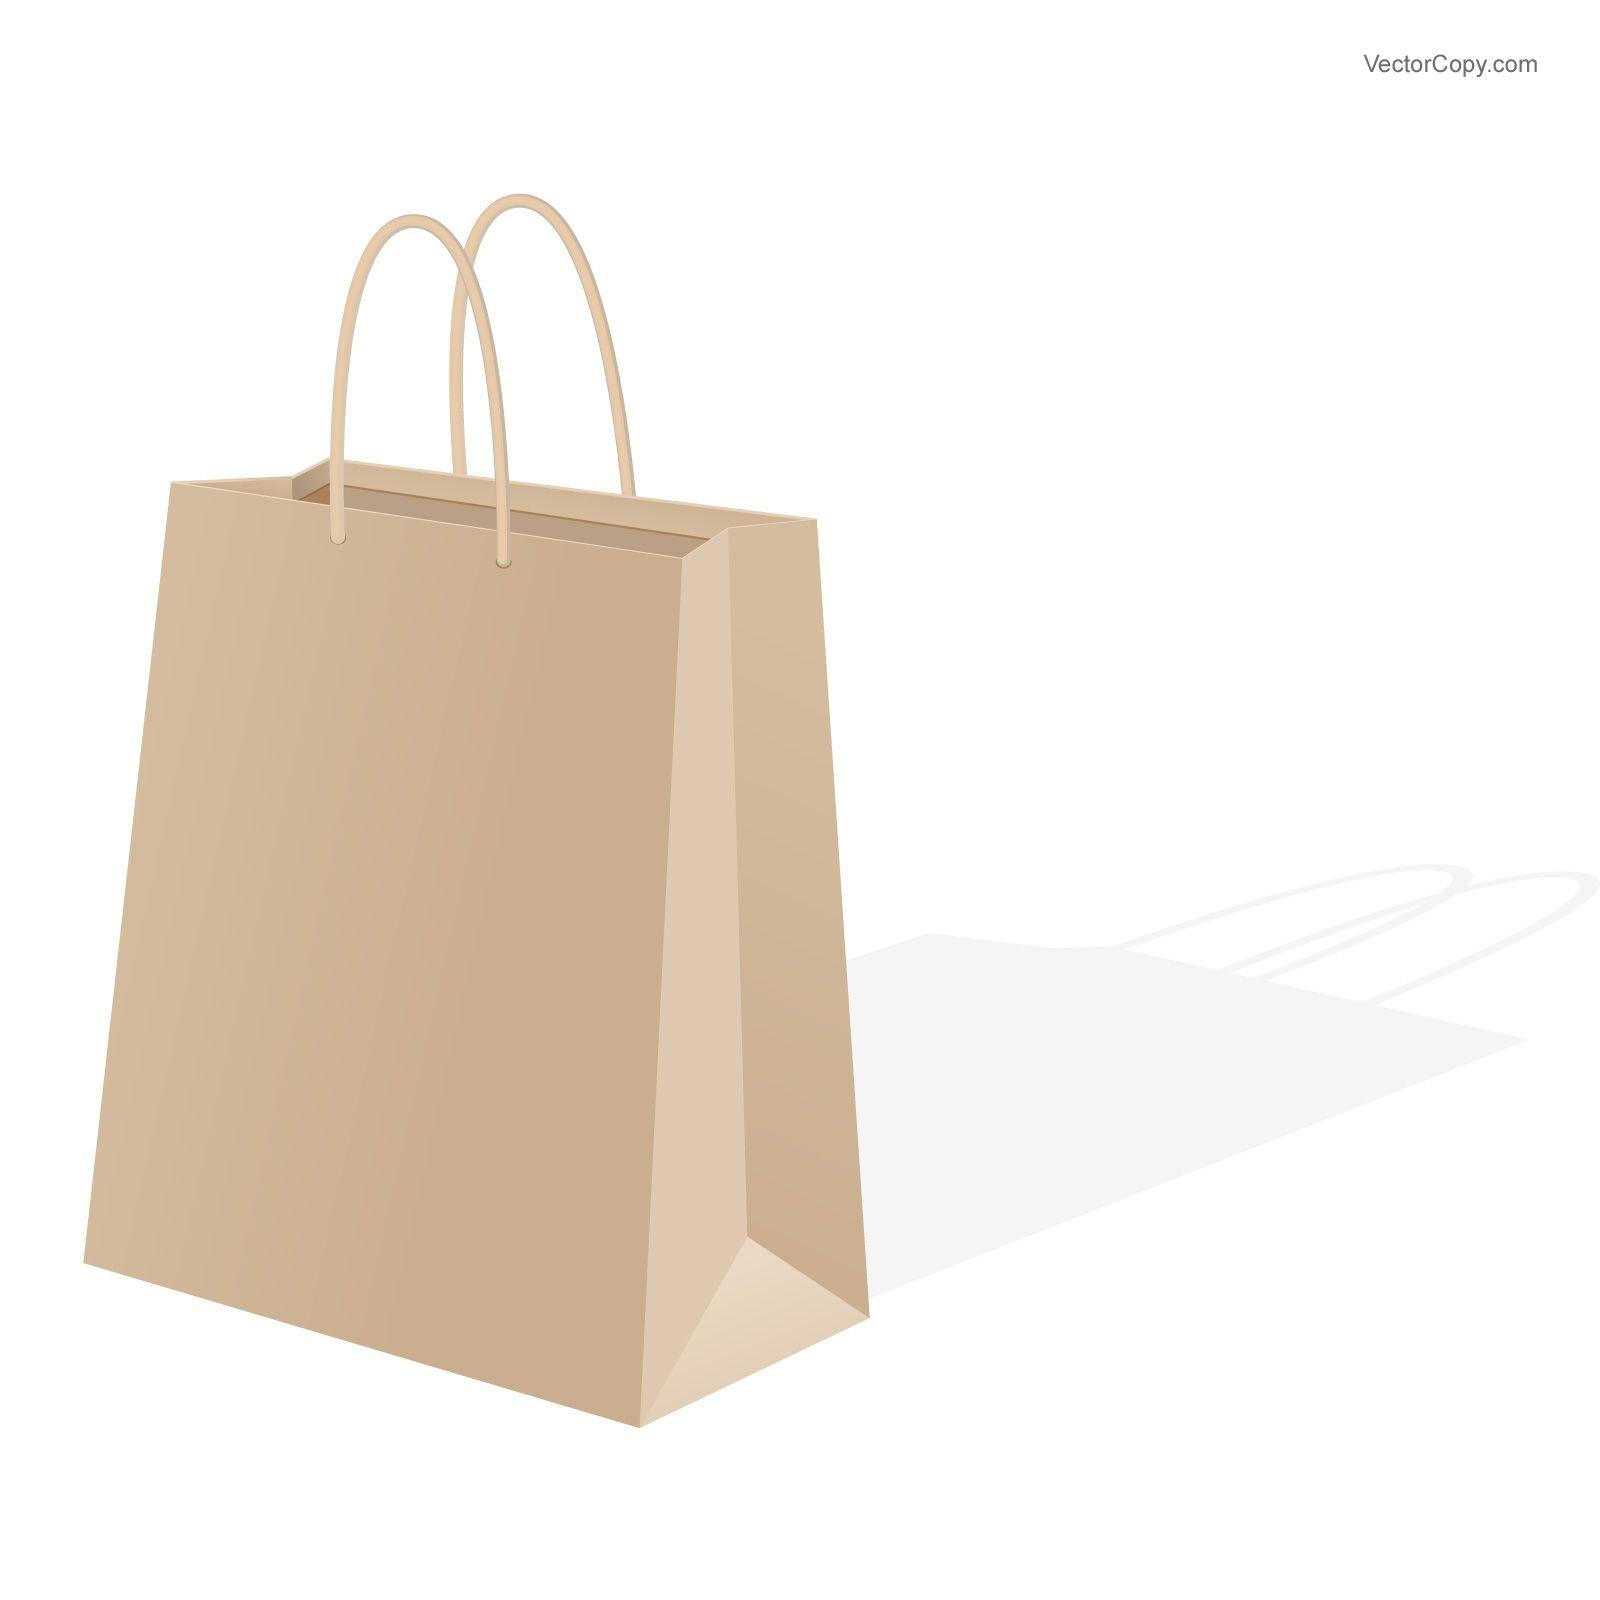 Paper bag vector clipart clipart transparent Paper shopping bag, download free vector images | Free Download ... clipart transparent